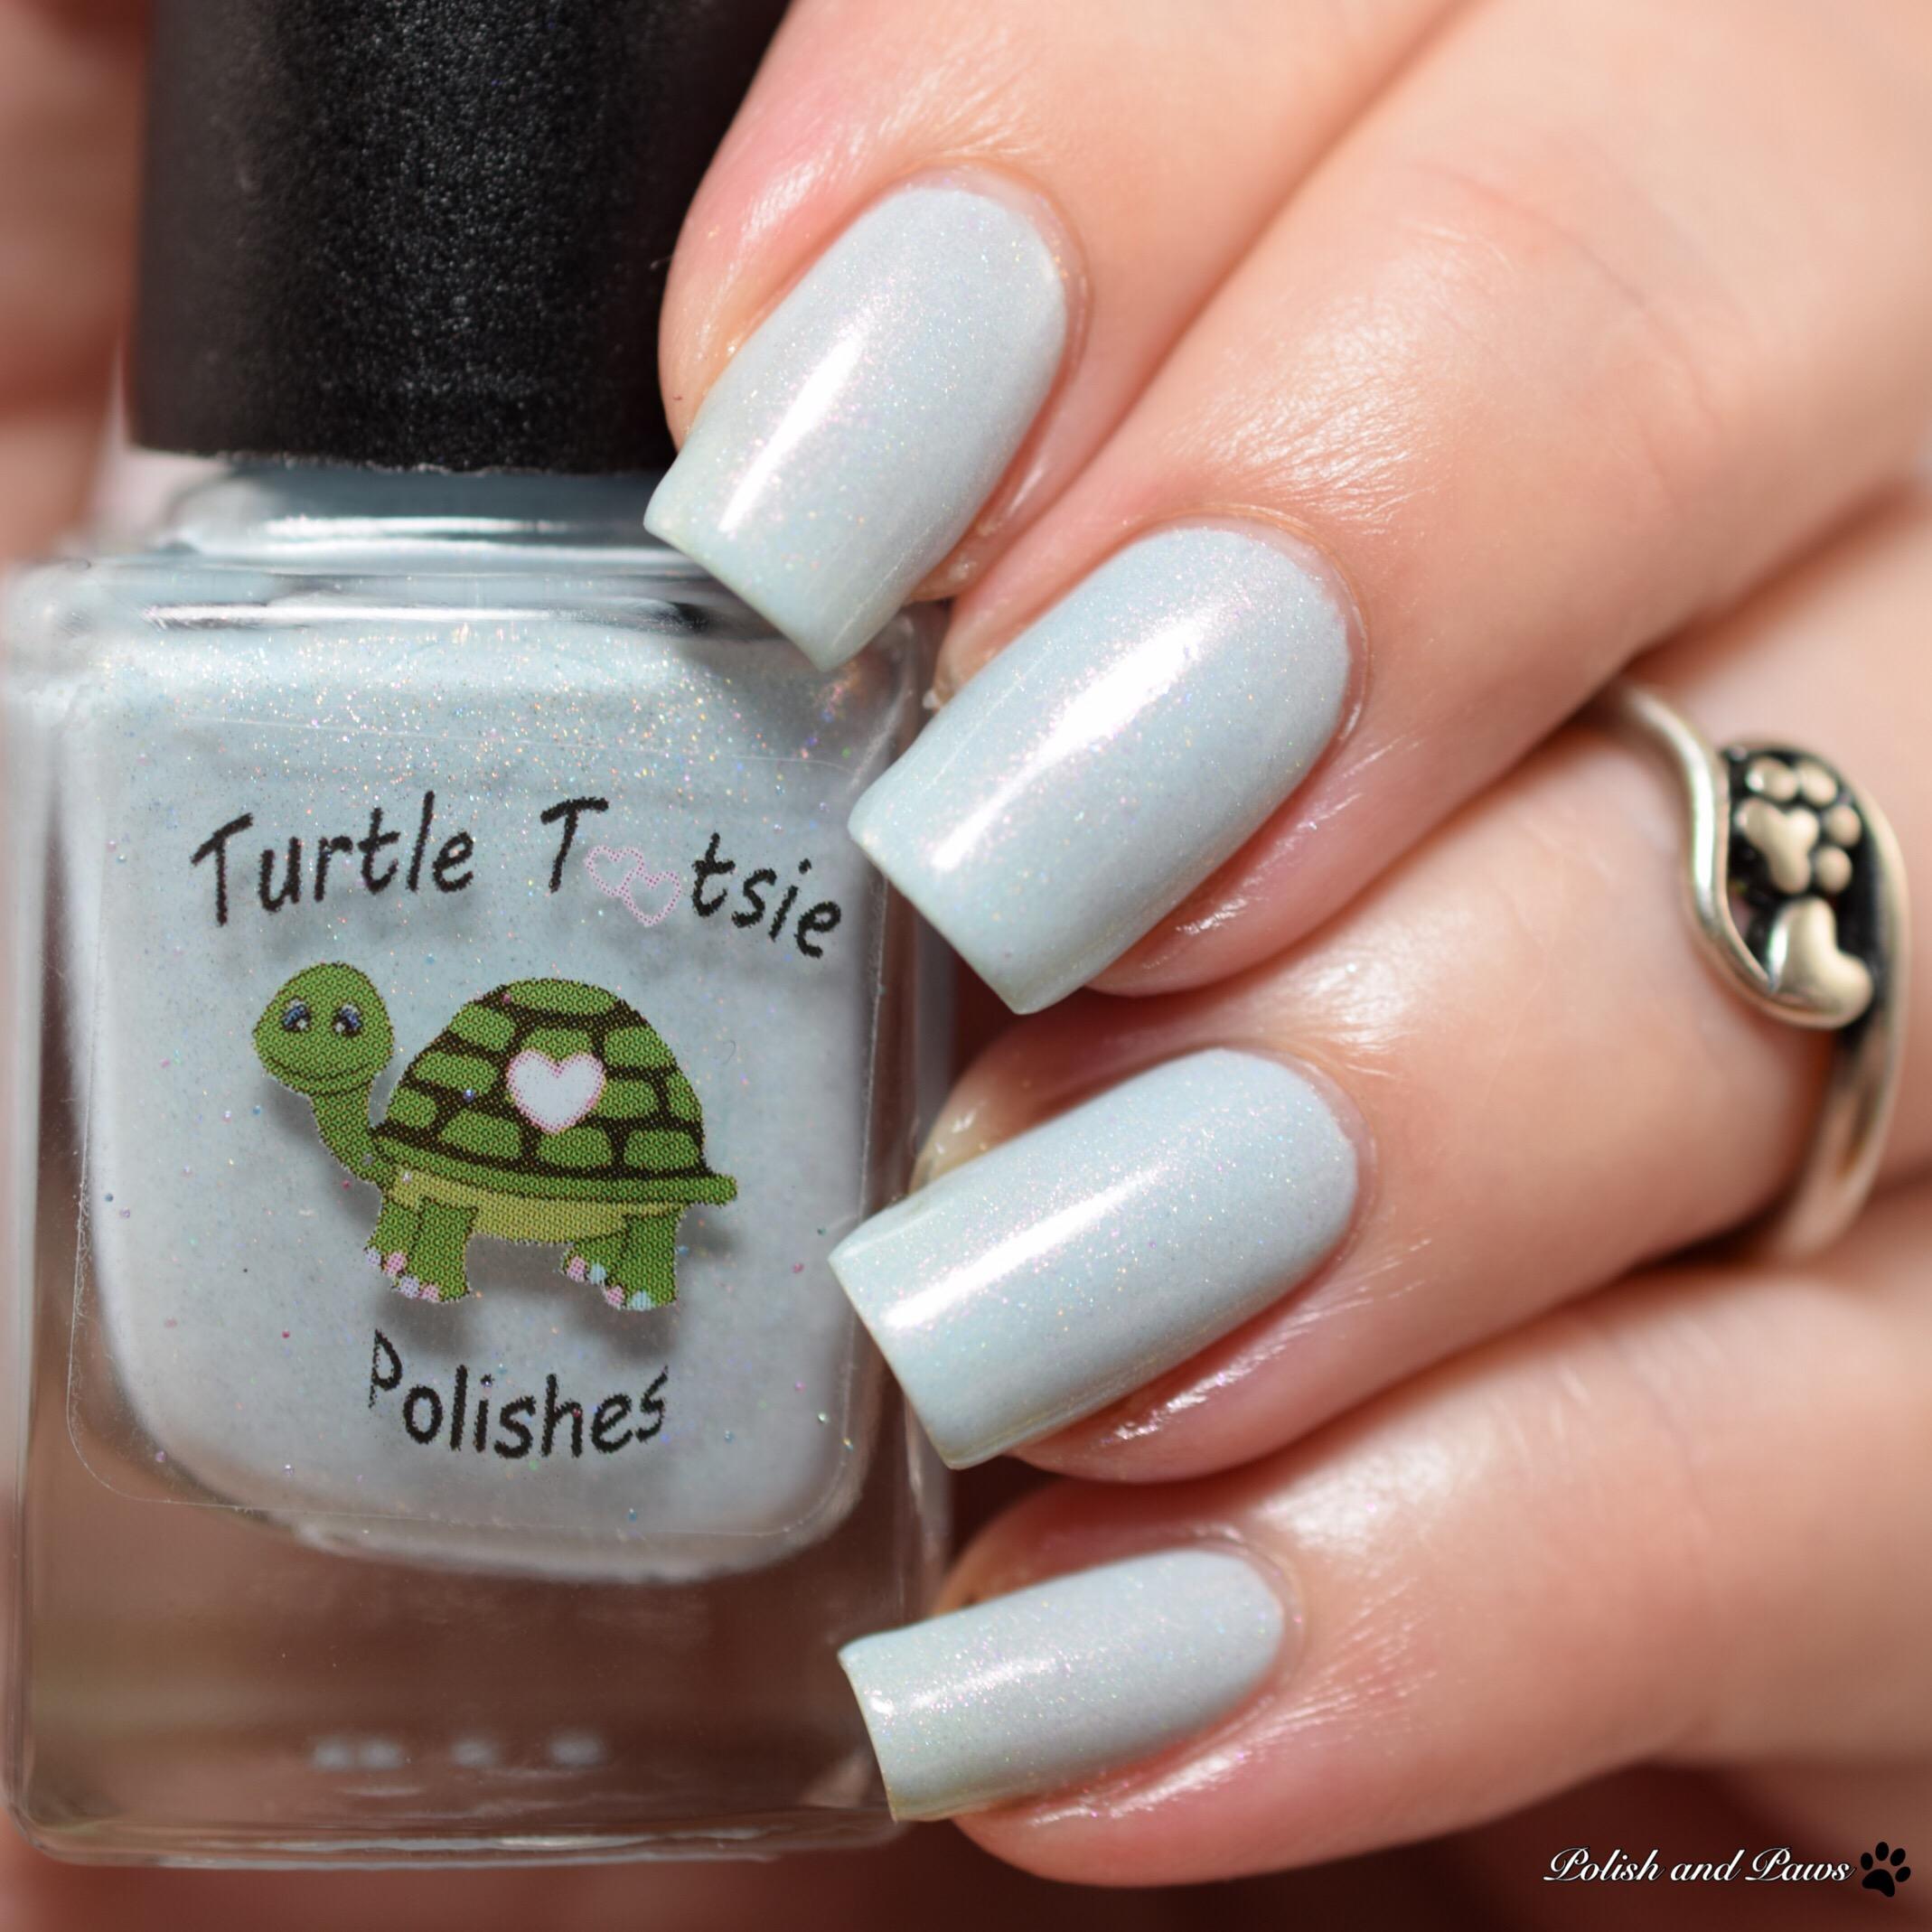 Turtle Tootsie Polishes Pal